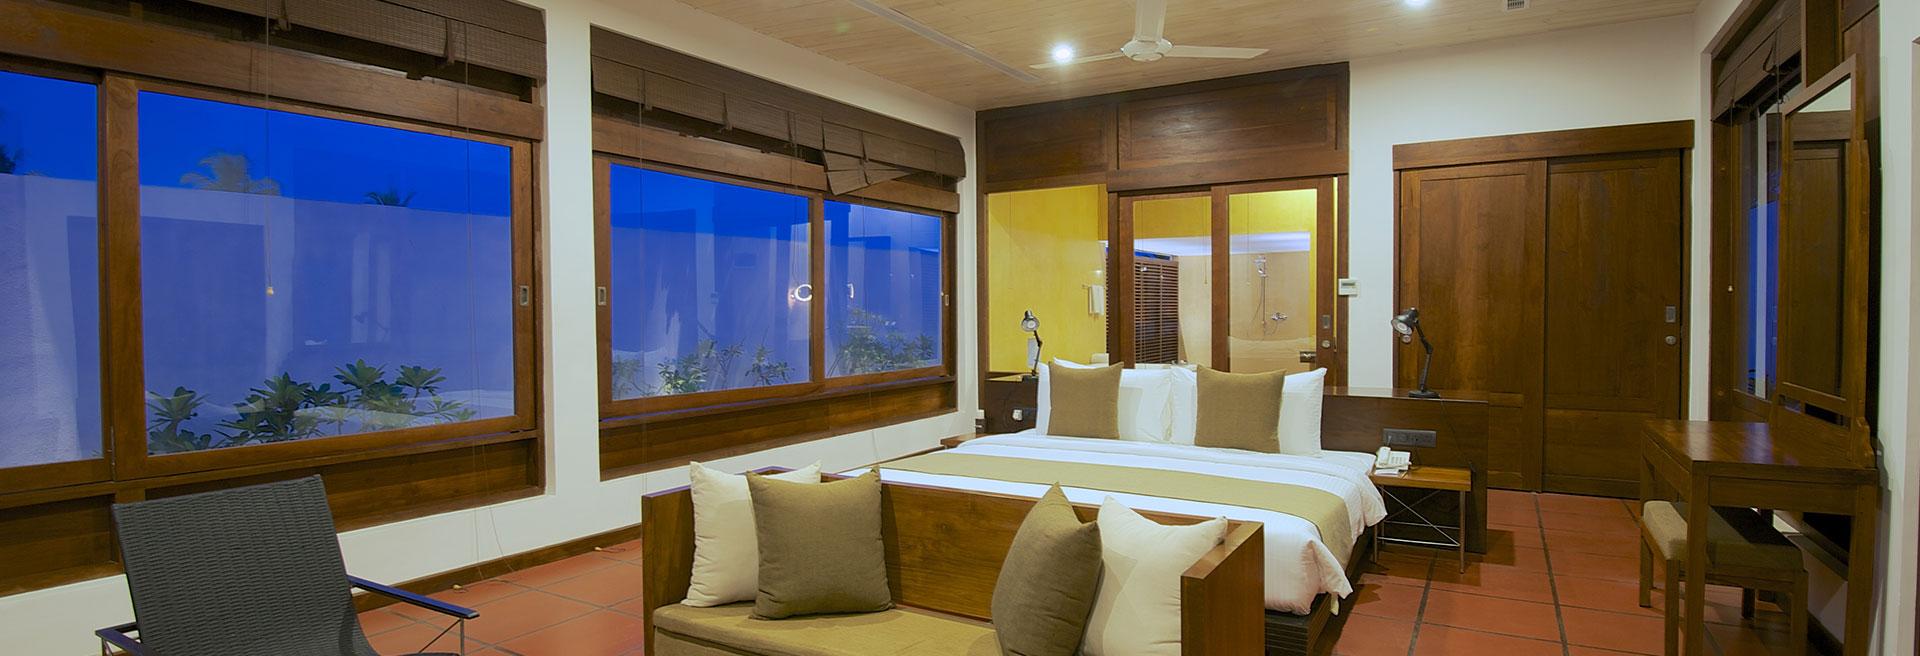 Luxury bedroom with windows all round